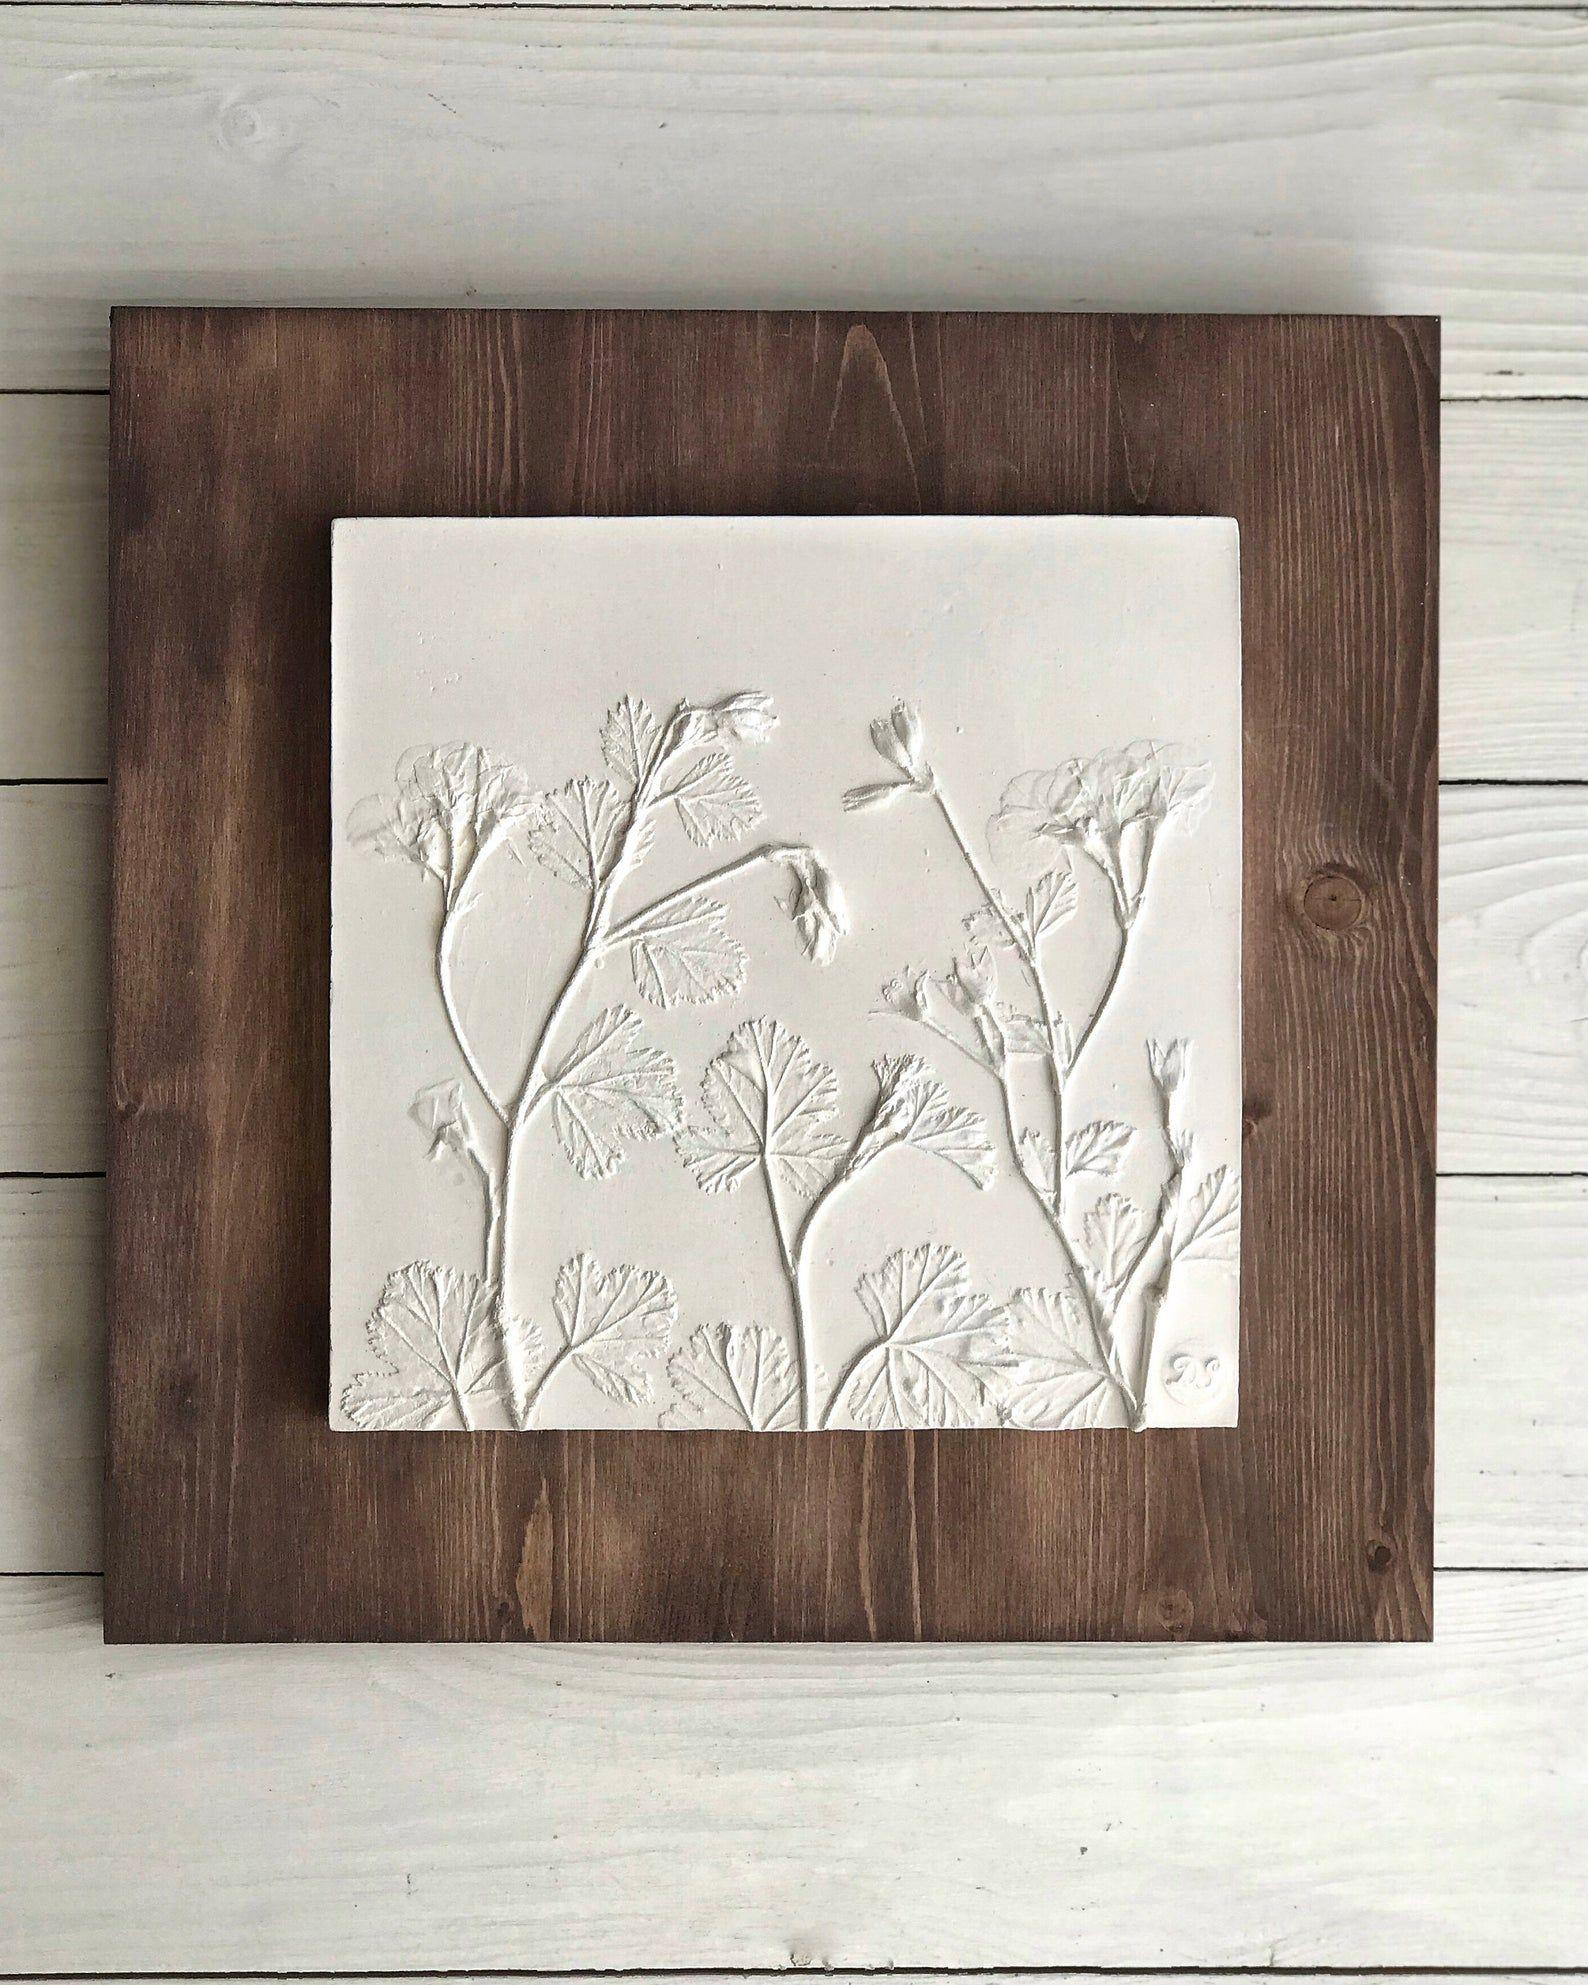 Square Scandinavian Plants Wall Sculpture Modern Plaster Cast Etsy In 2020 Above Bed Decor Plaster Wall Art Wall Sculptures